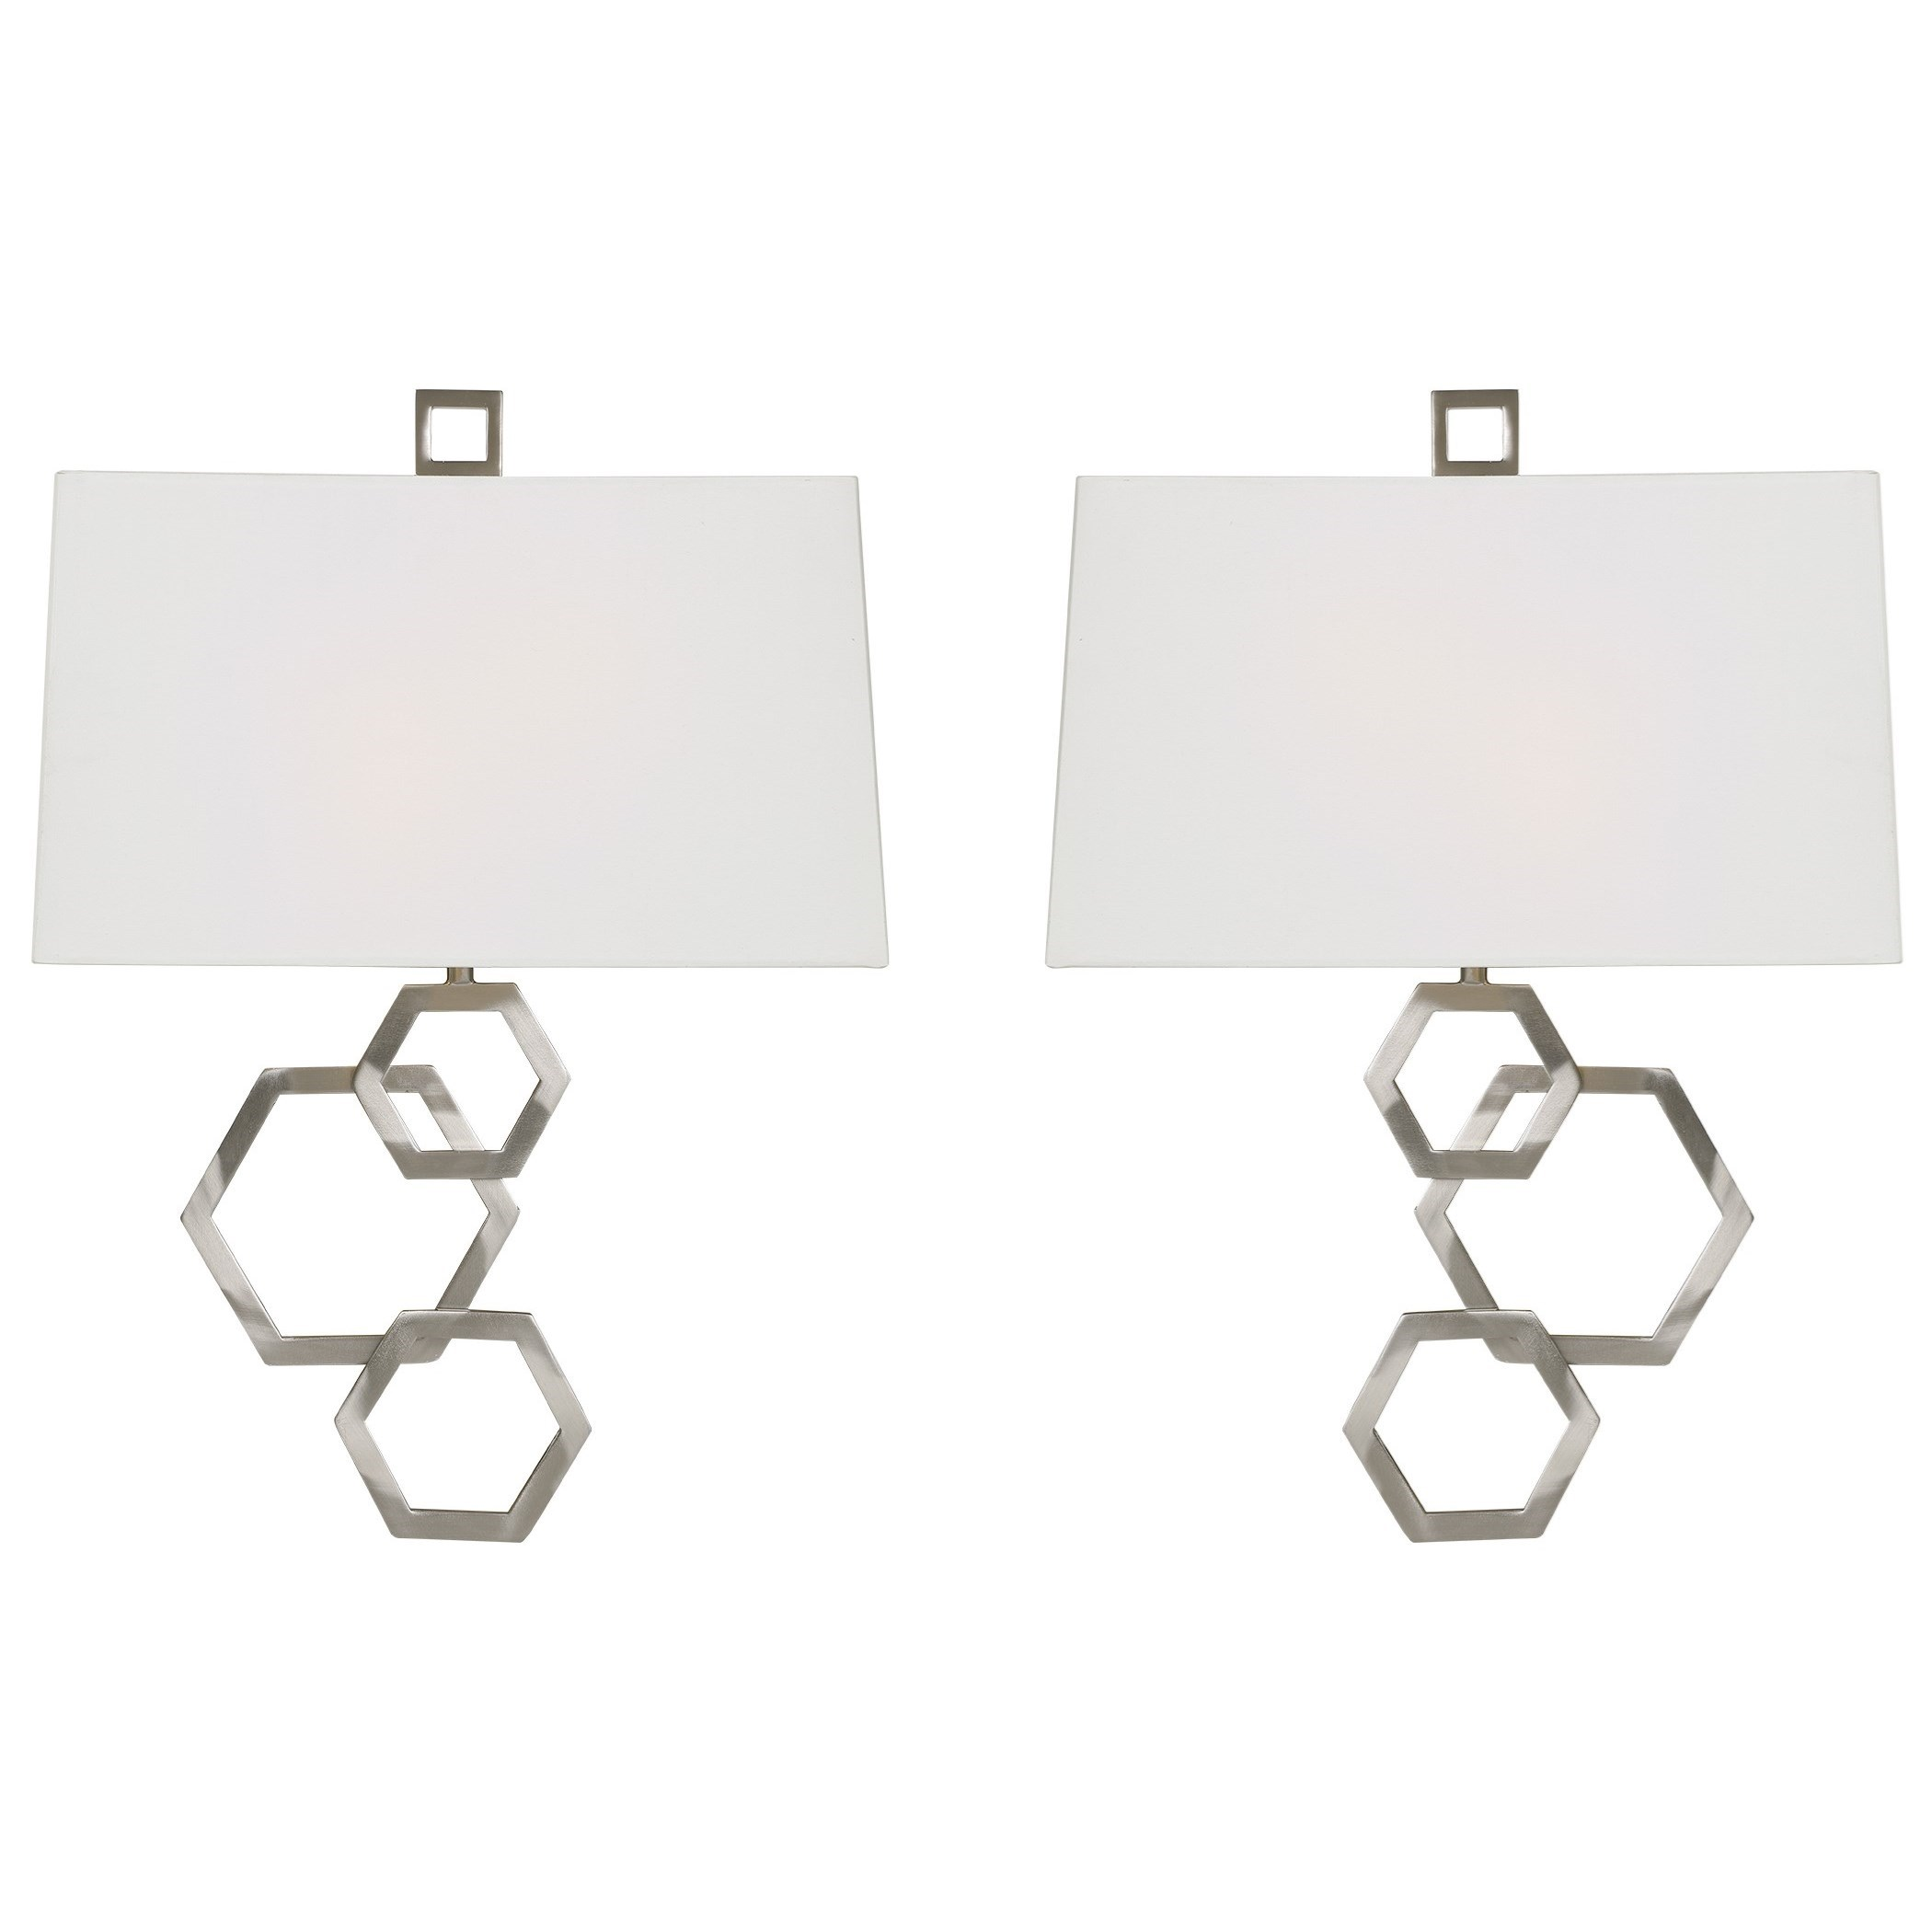 Lighting Fixtures - Wall Sconces Deseret Nickel 2 Light Sconce Set of 2 by Uttermost at Mueller Furniture